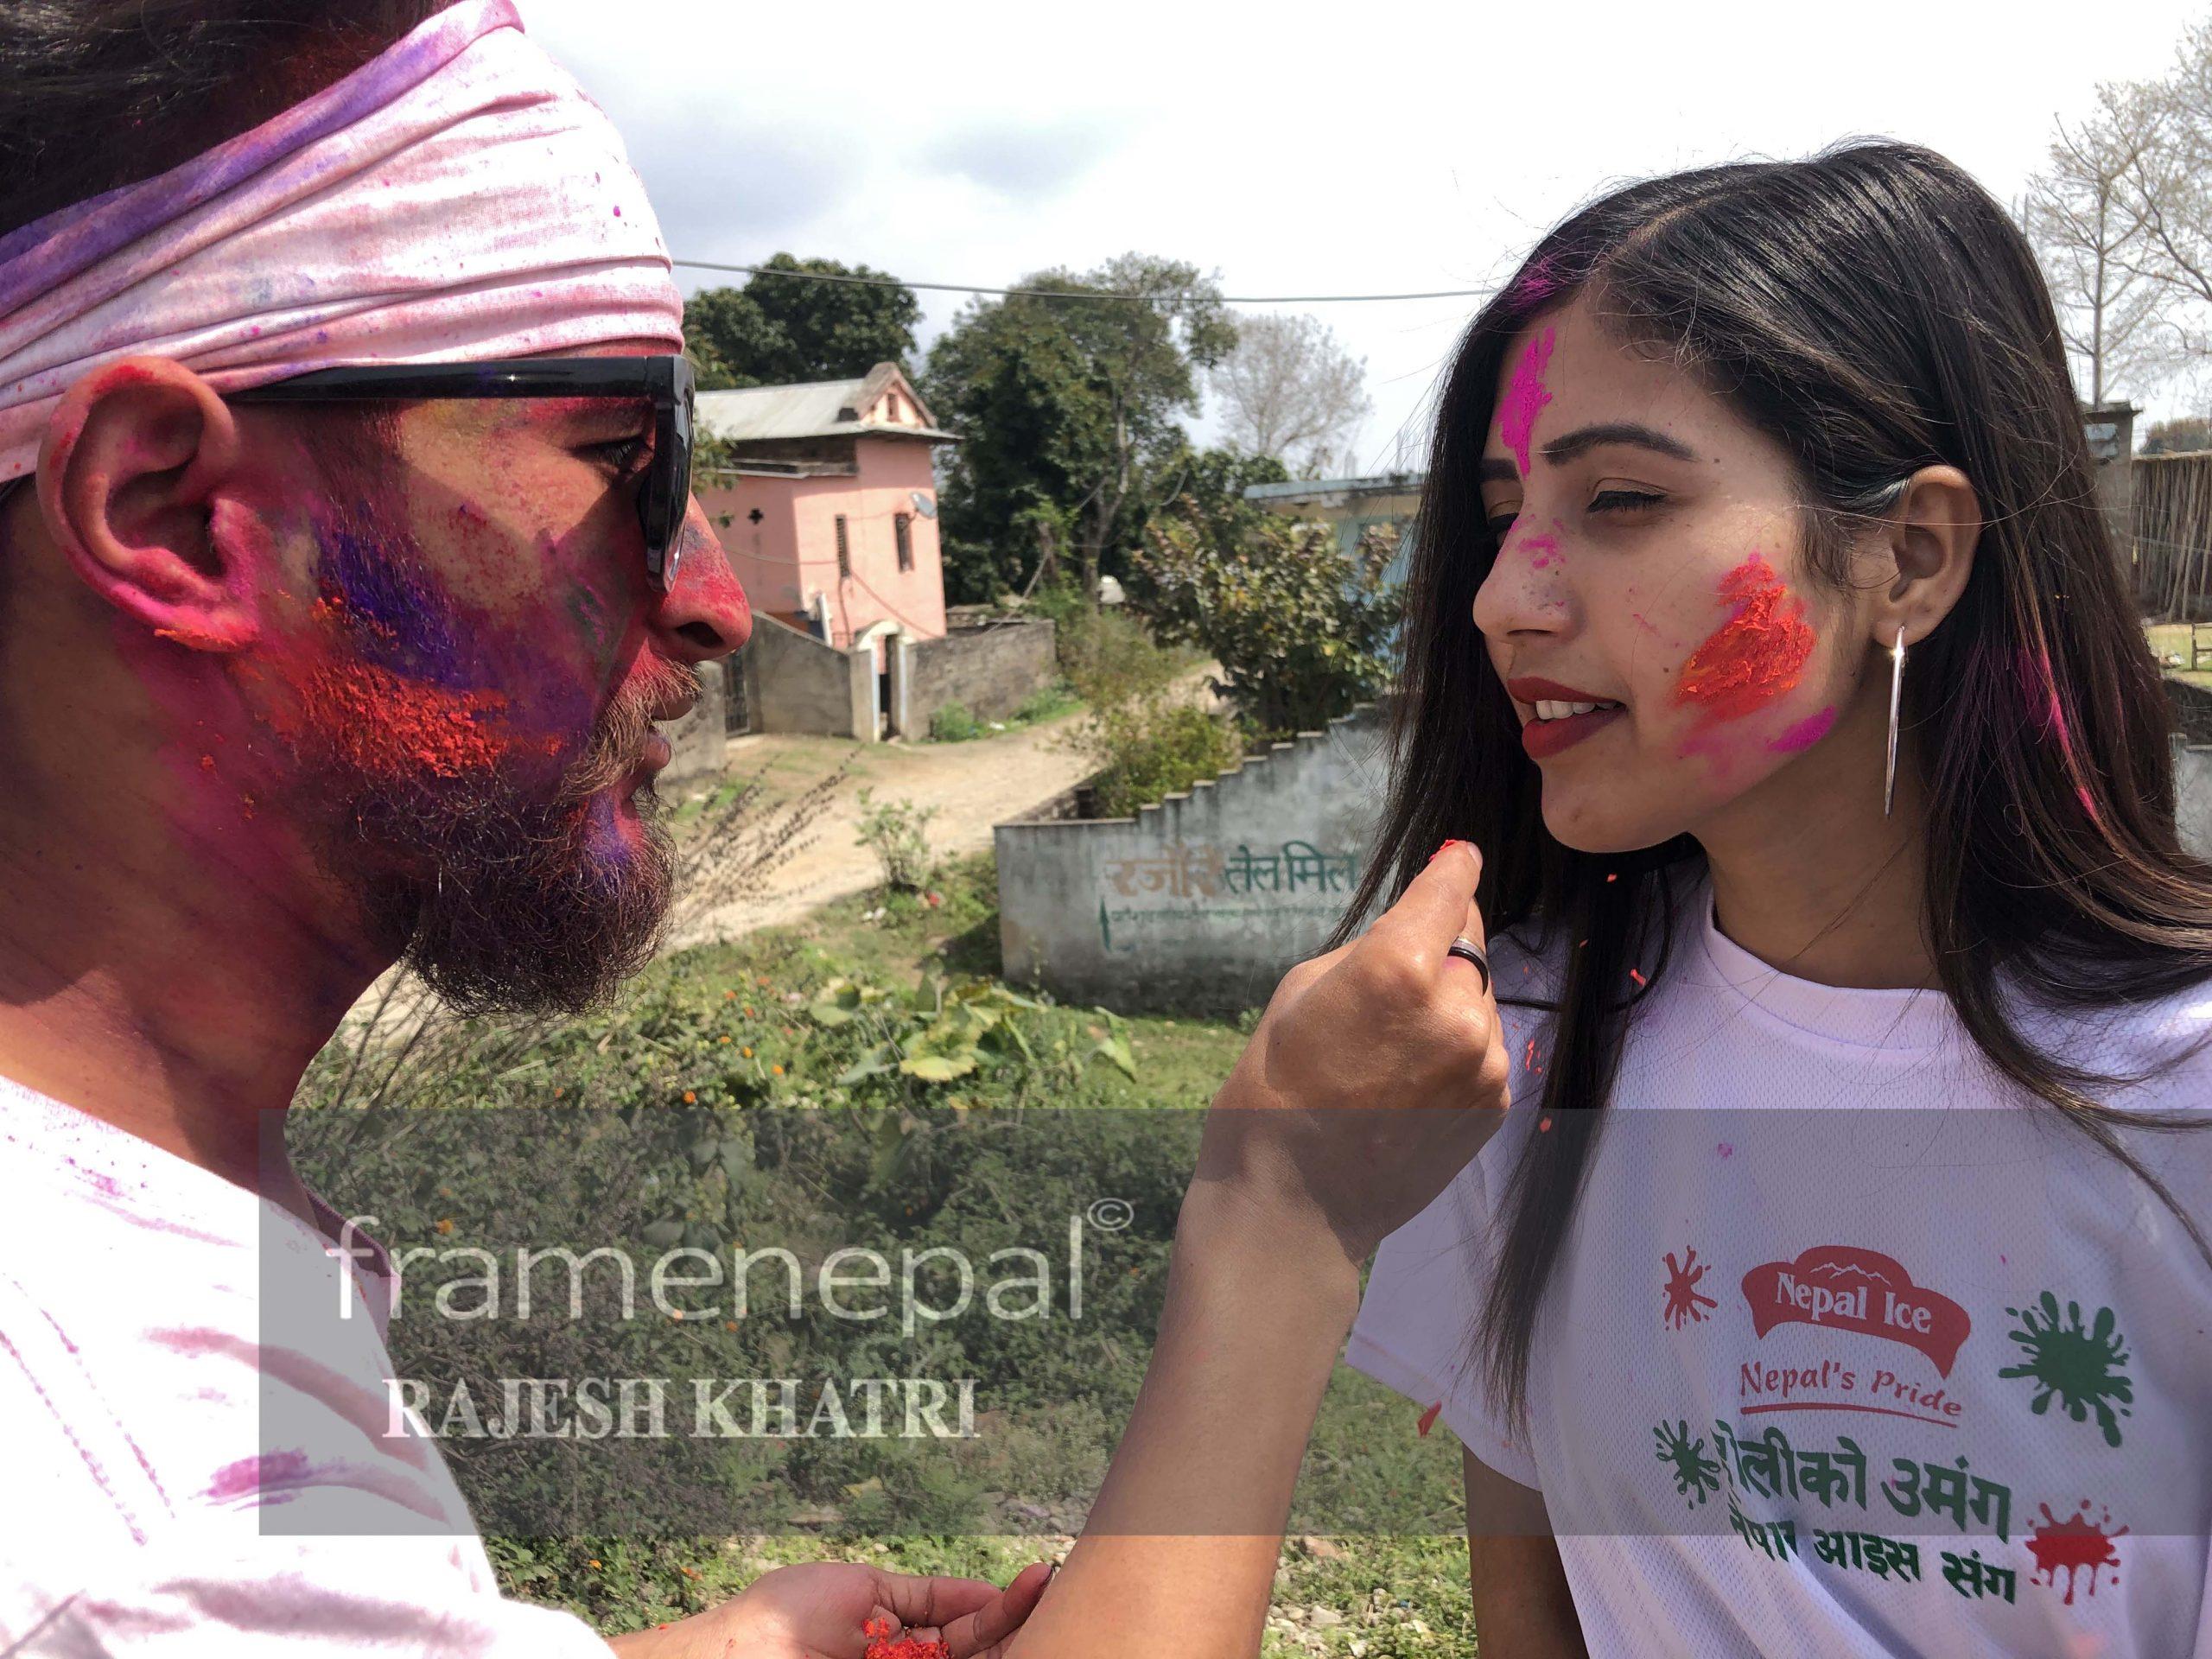 Holi Festival, Holi Best Image 2020, Best Images for Holi, holi story, holi festival essay, history of holi, holi pronunciation, holi utsav, holi festival nepal 2020